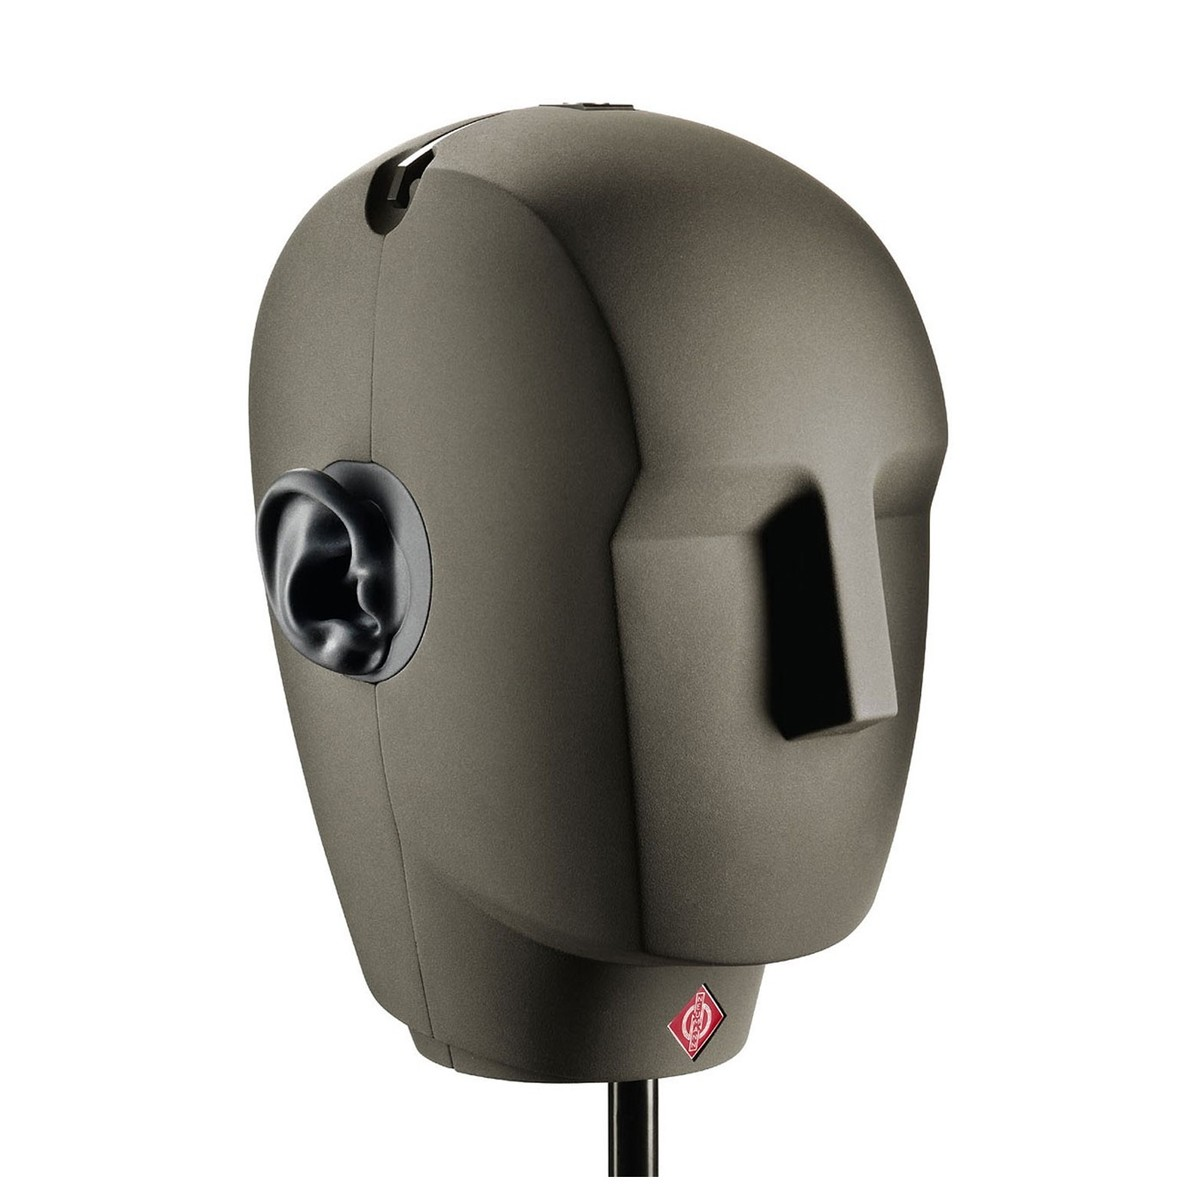 Neumann Ku 100 Dummy Head With Binaural Stereo Microphone